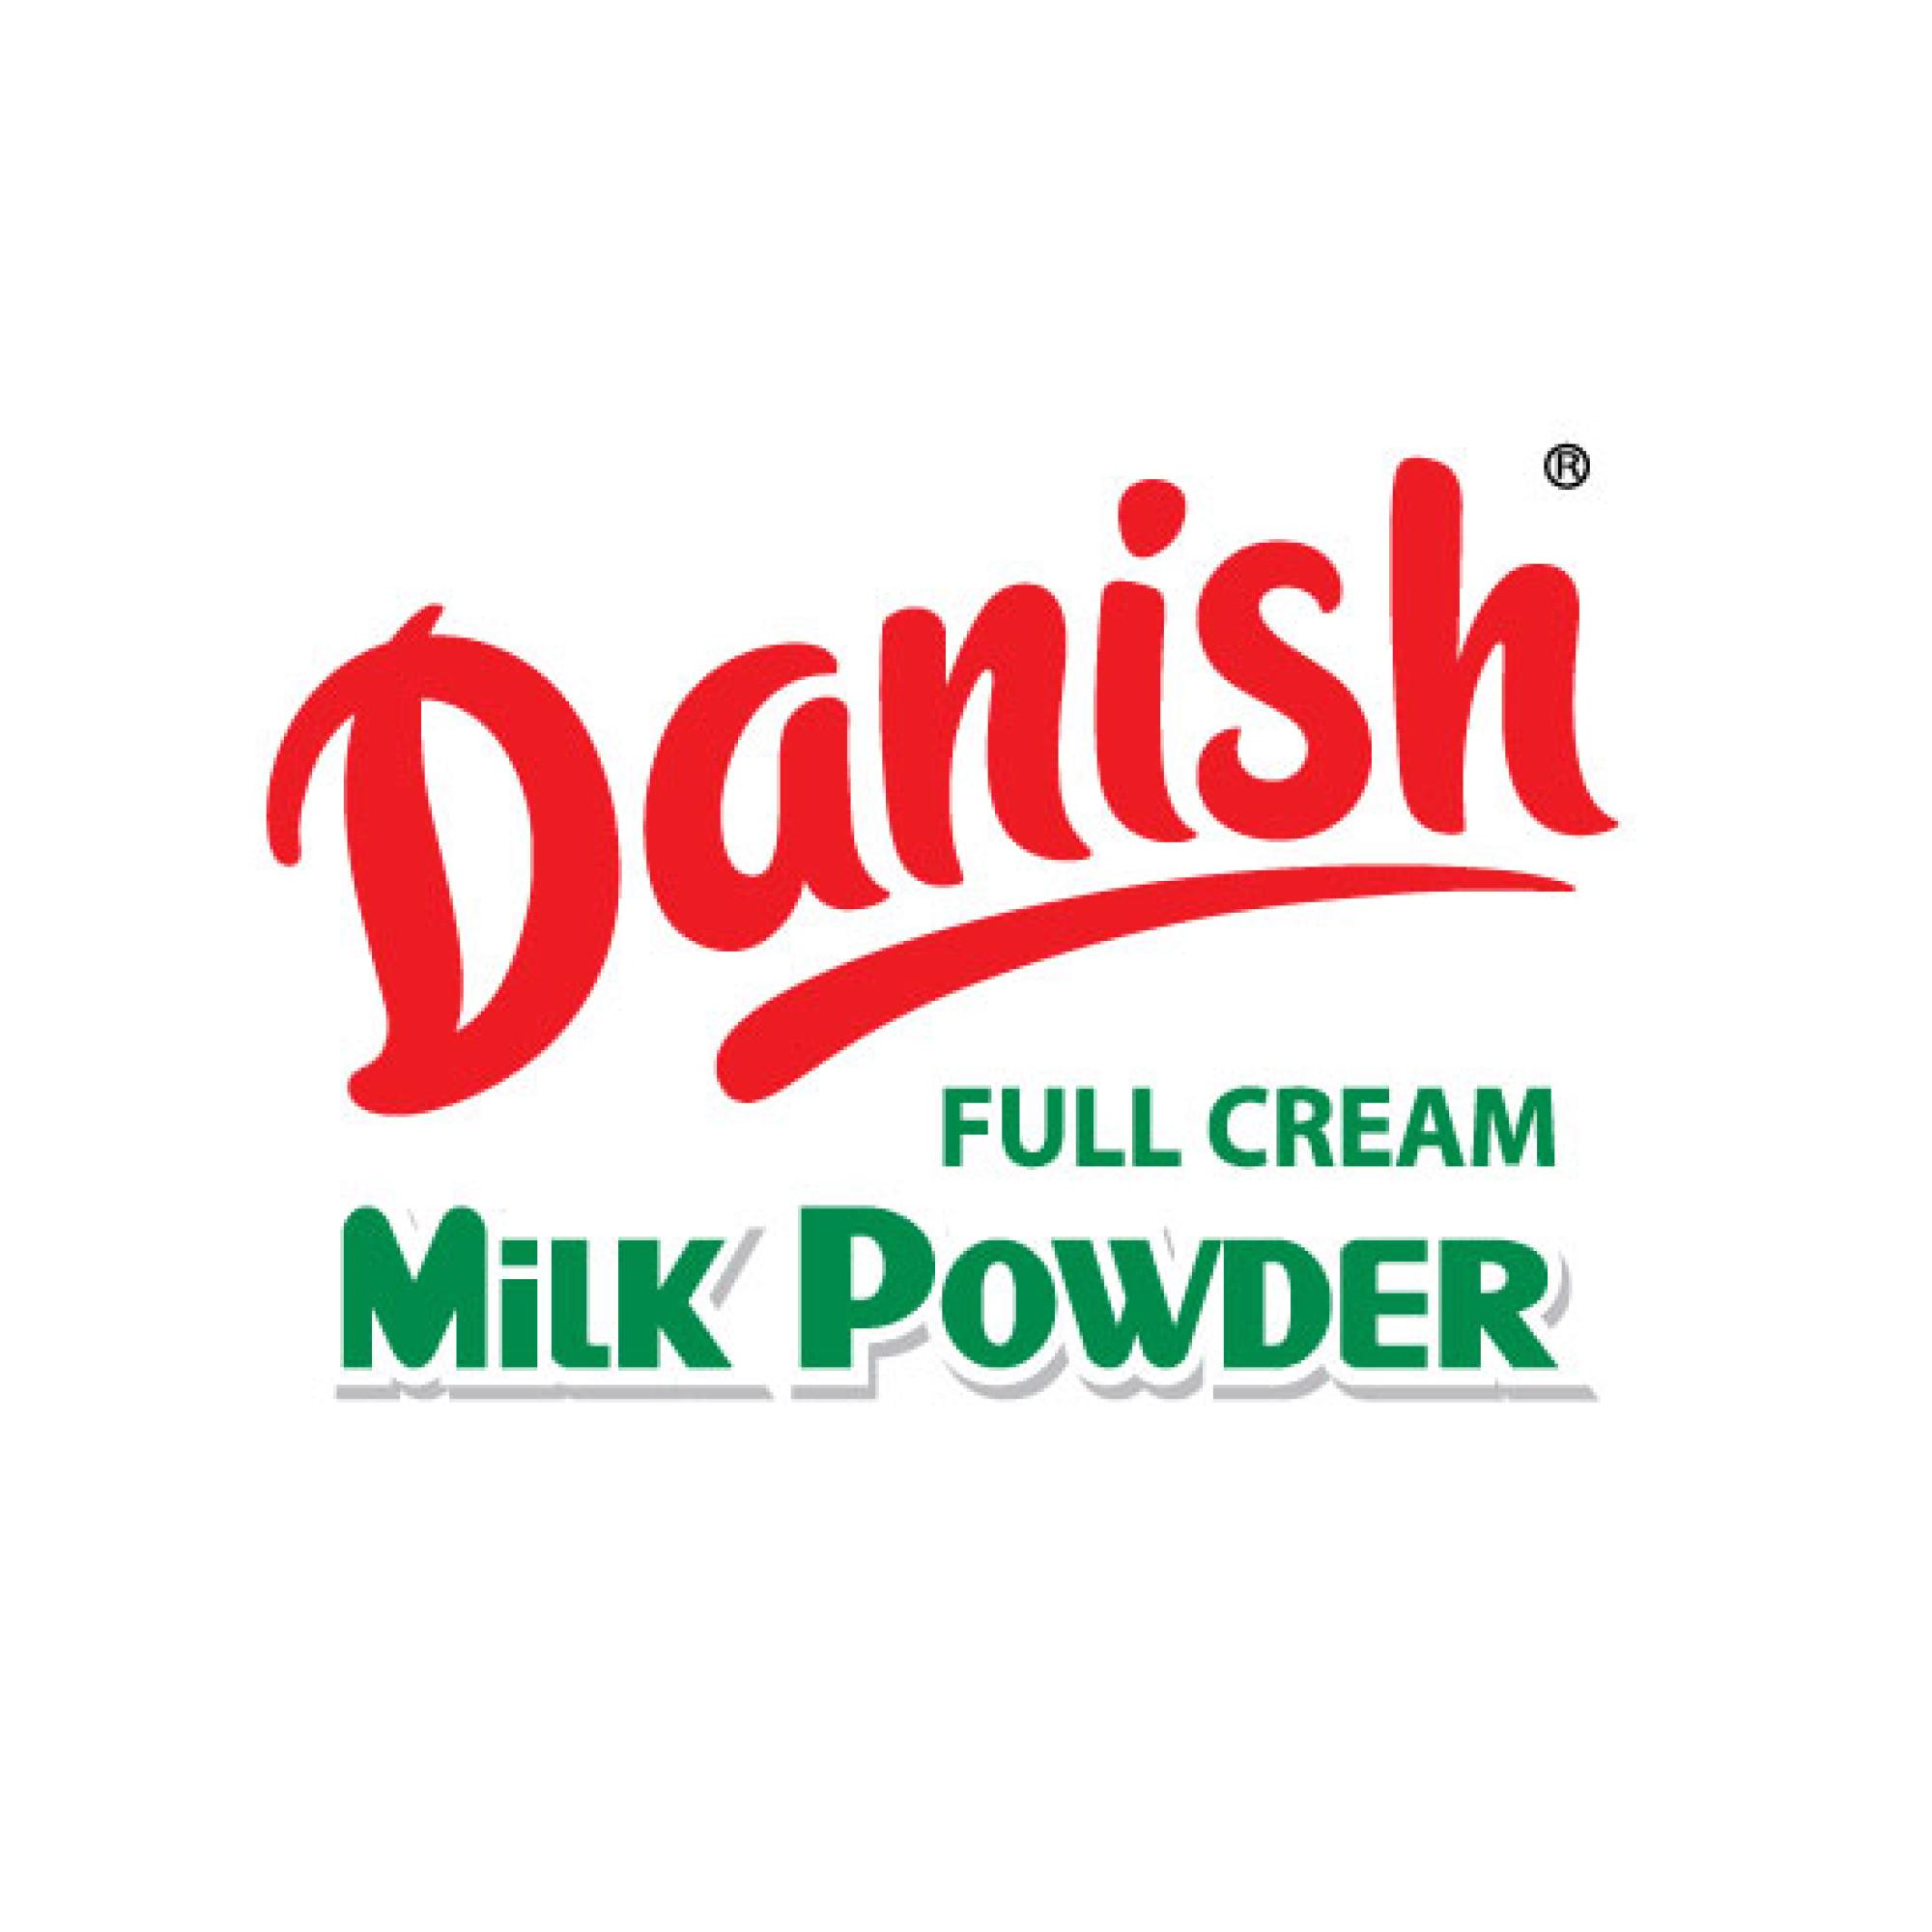 Danish Milk